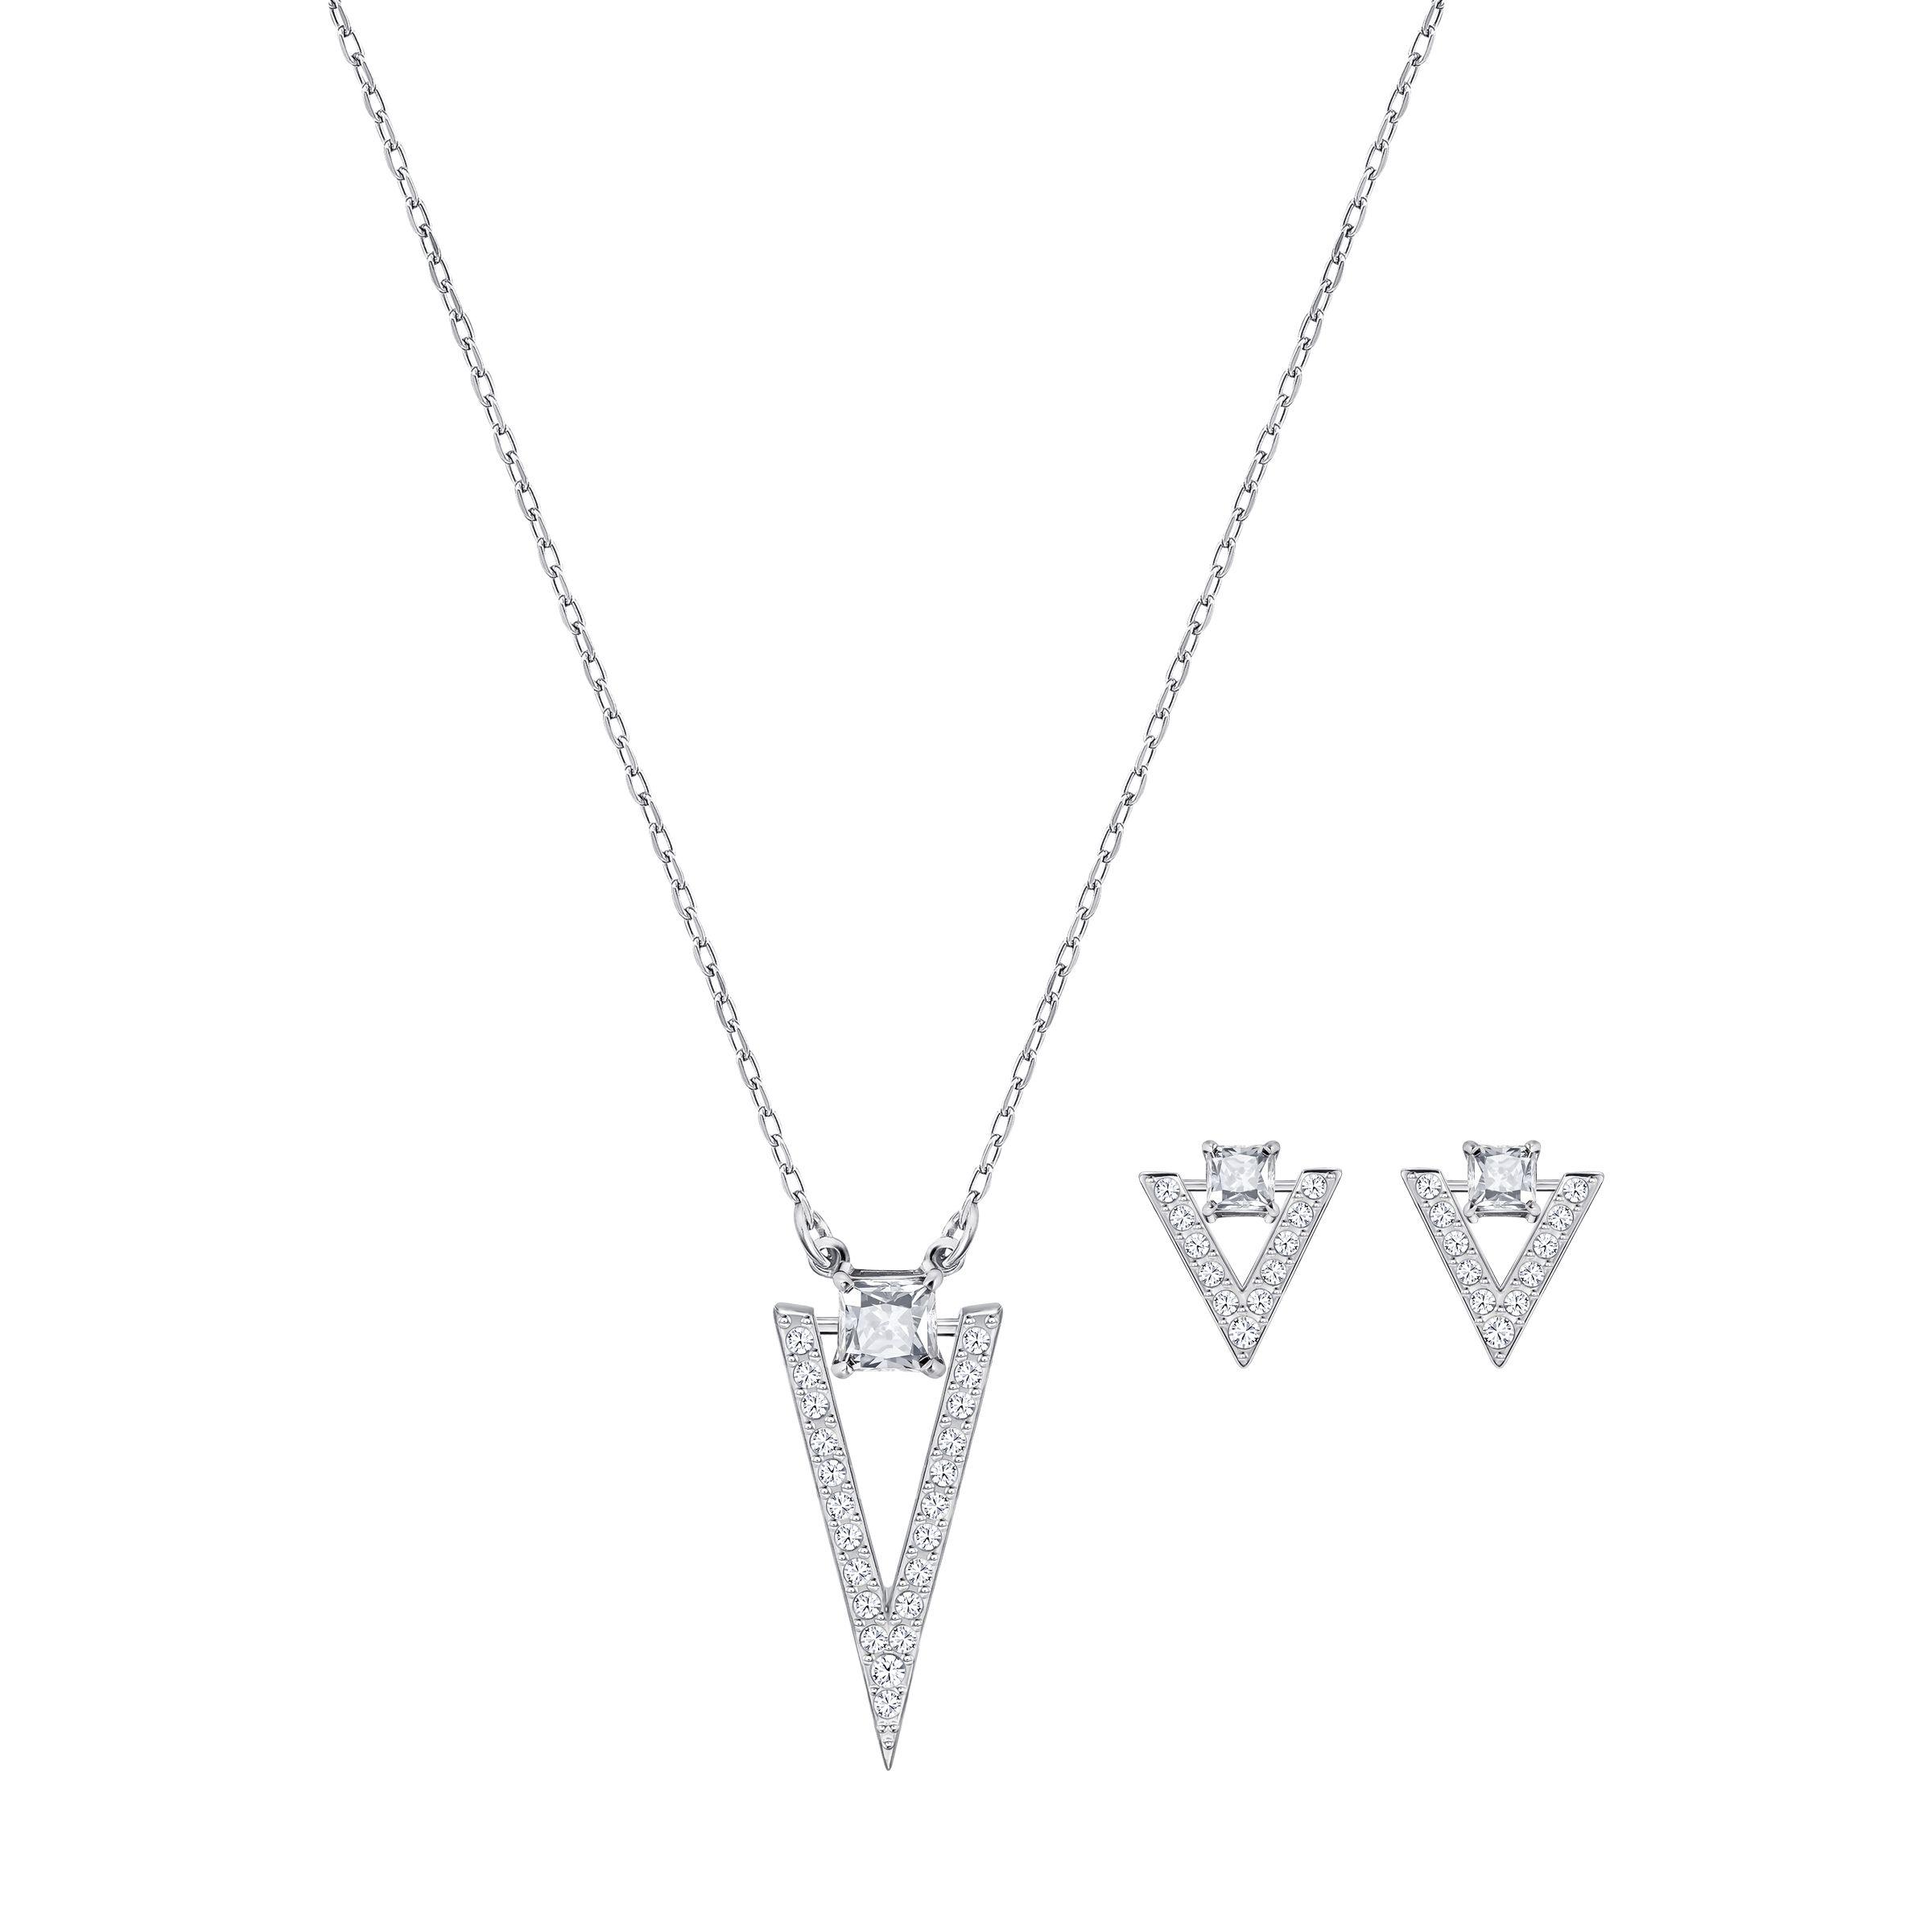 7c68a70de2eca FUNK Collection - Necklace #Crystals #Necklace #JewelleryDesigner ...